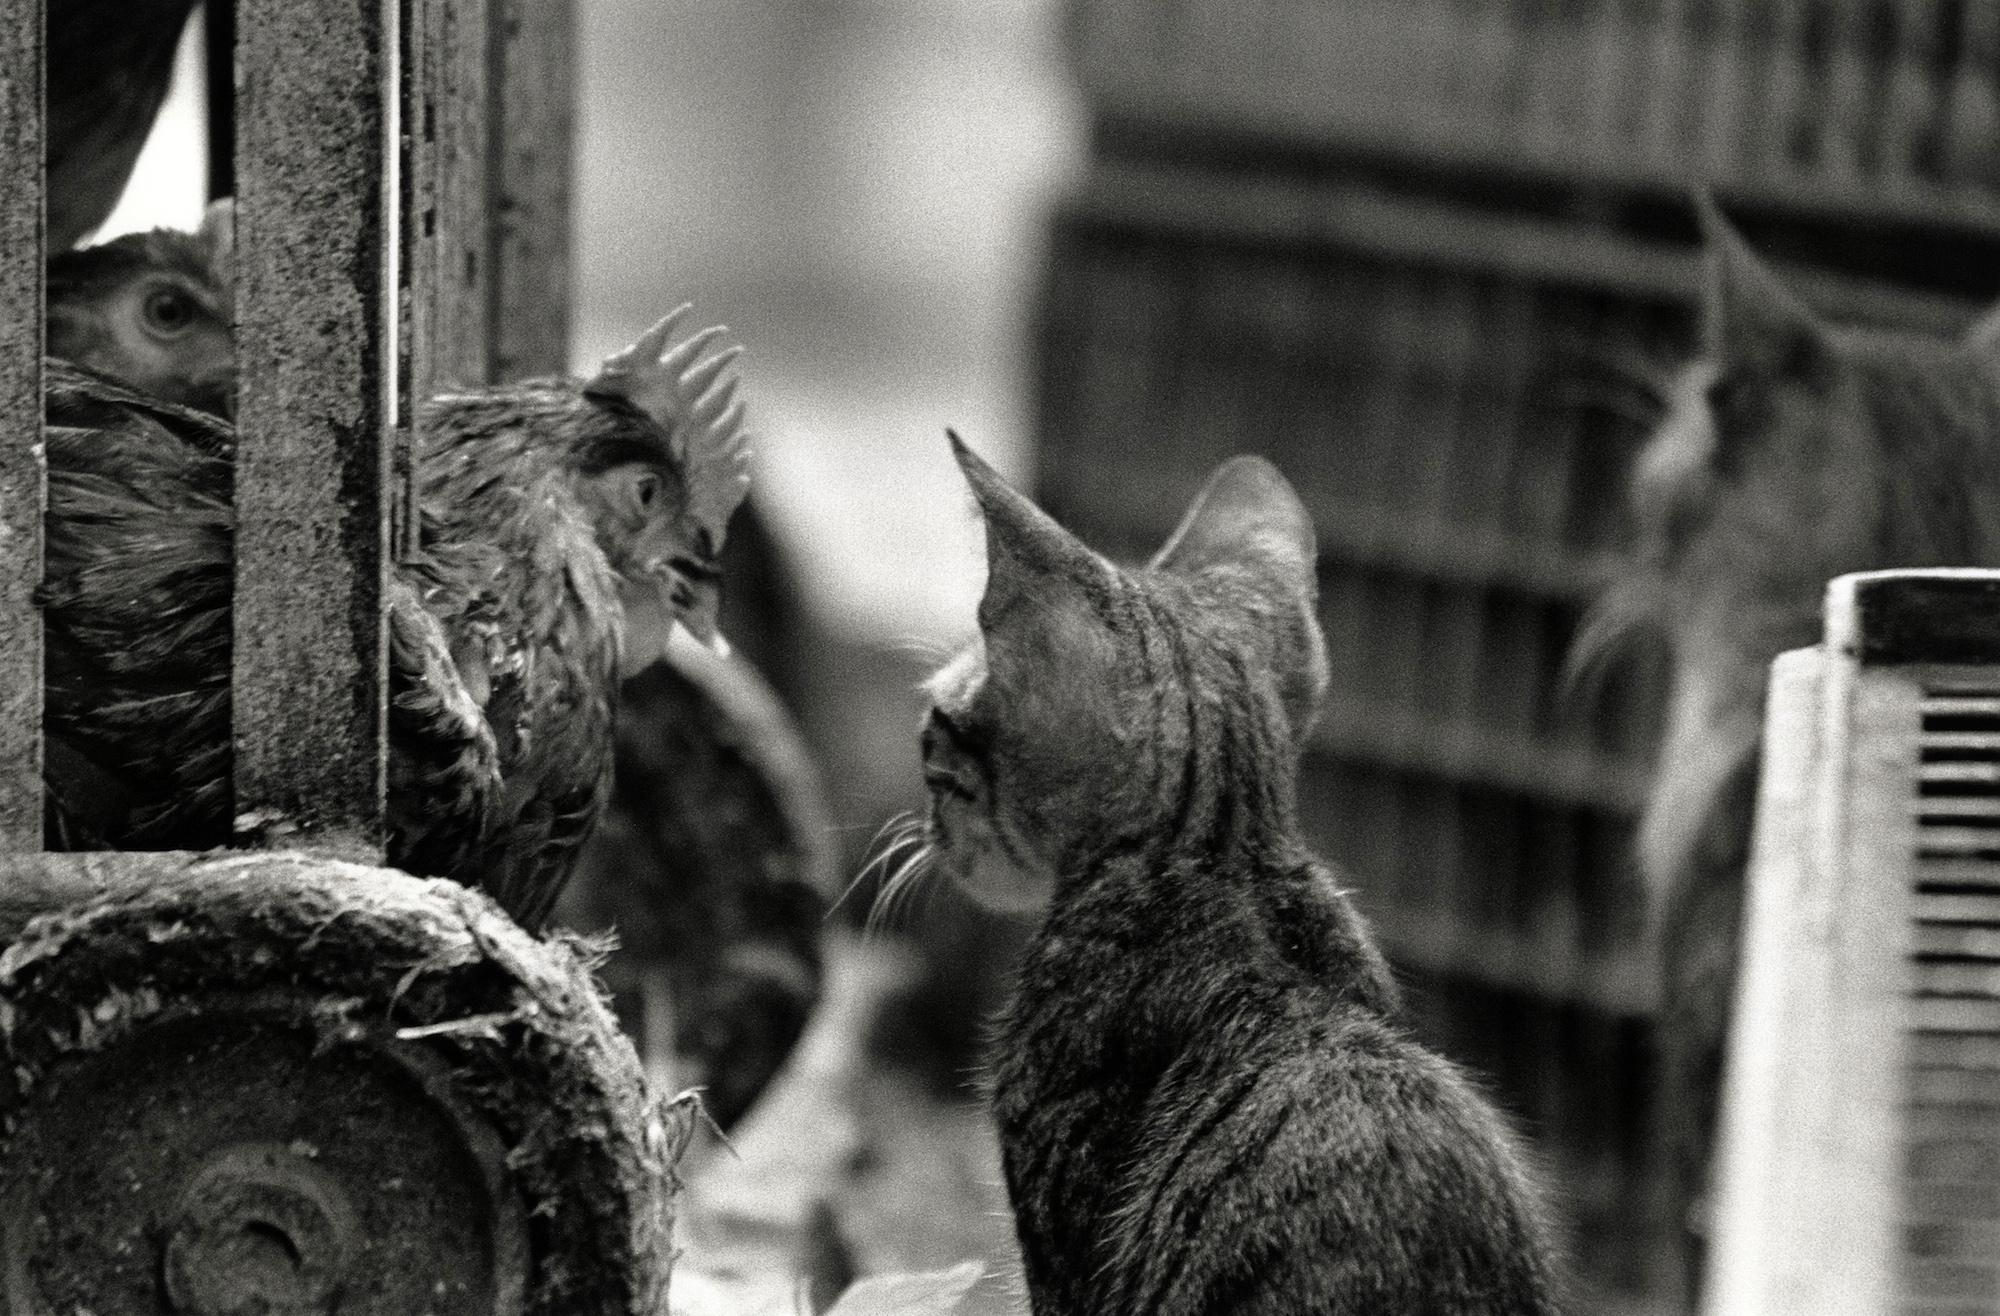 walter_rothwell_photography_cats-07.jpg